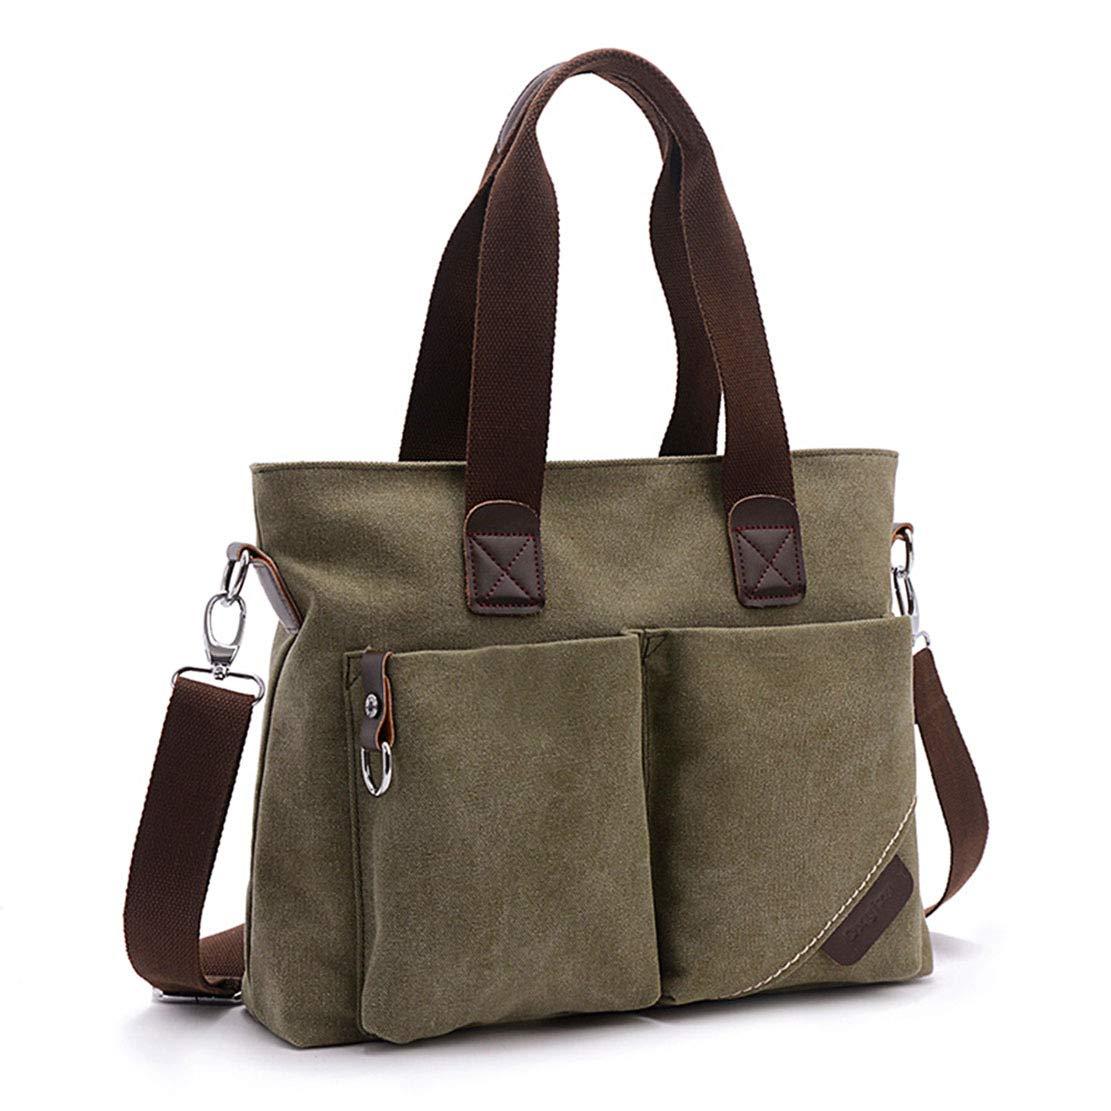 25d686875e Amazon.com  ToLFE Women Top Handle Satchel Handbags Tote Purse Shoulder Bag   Shoes